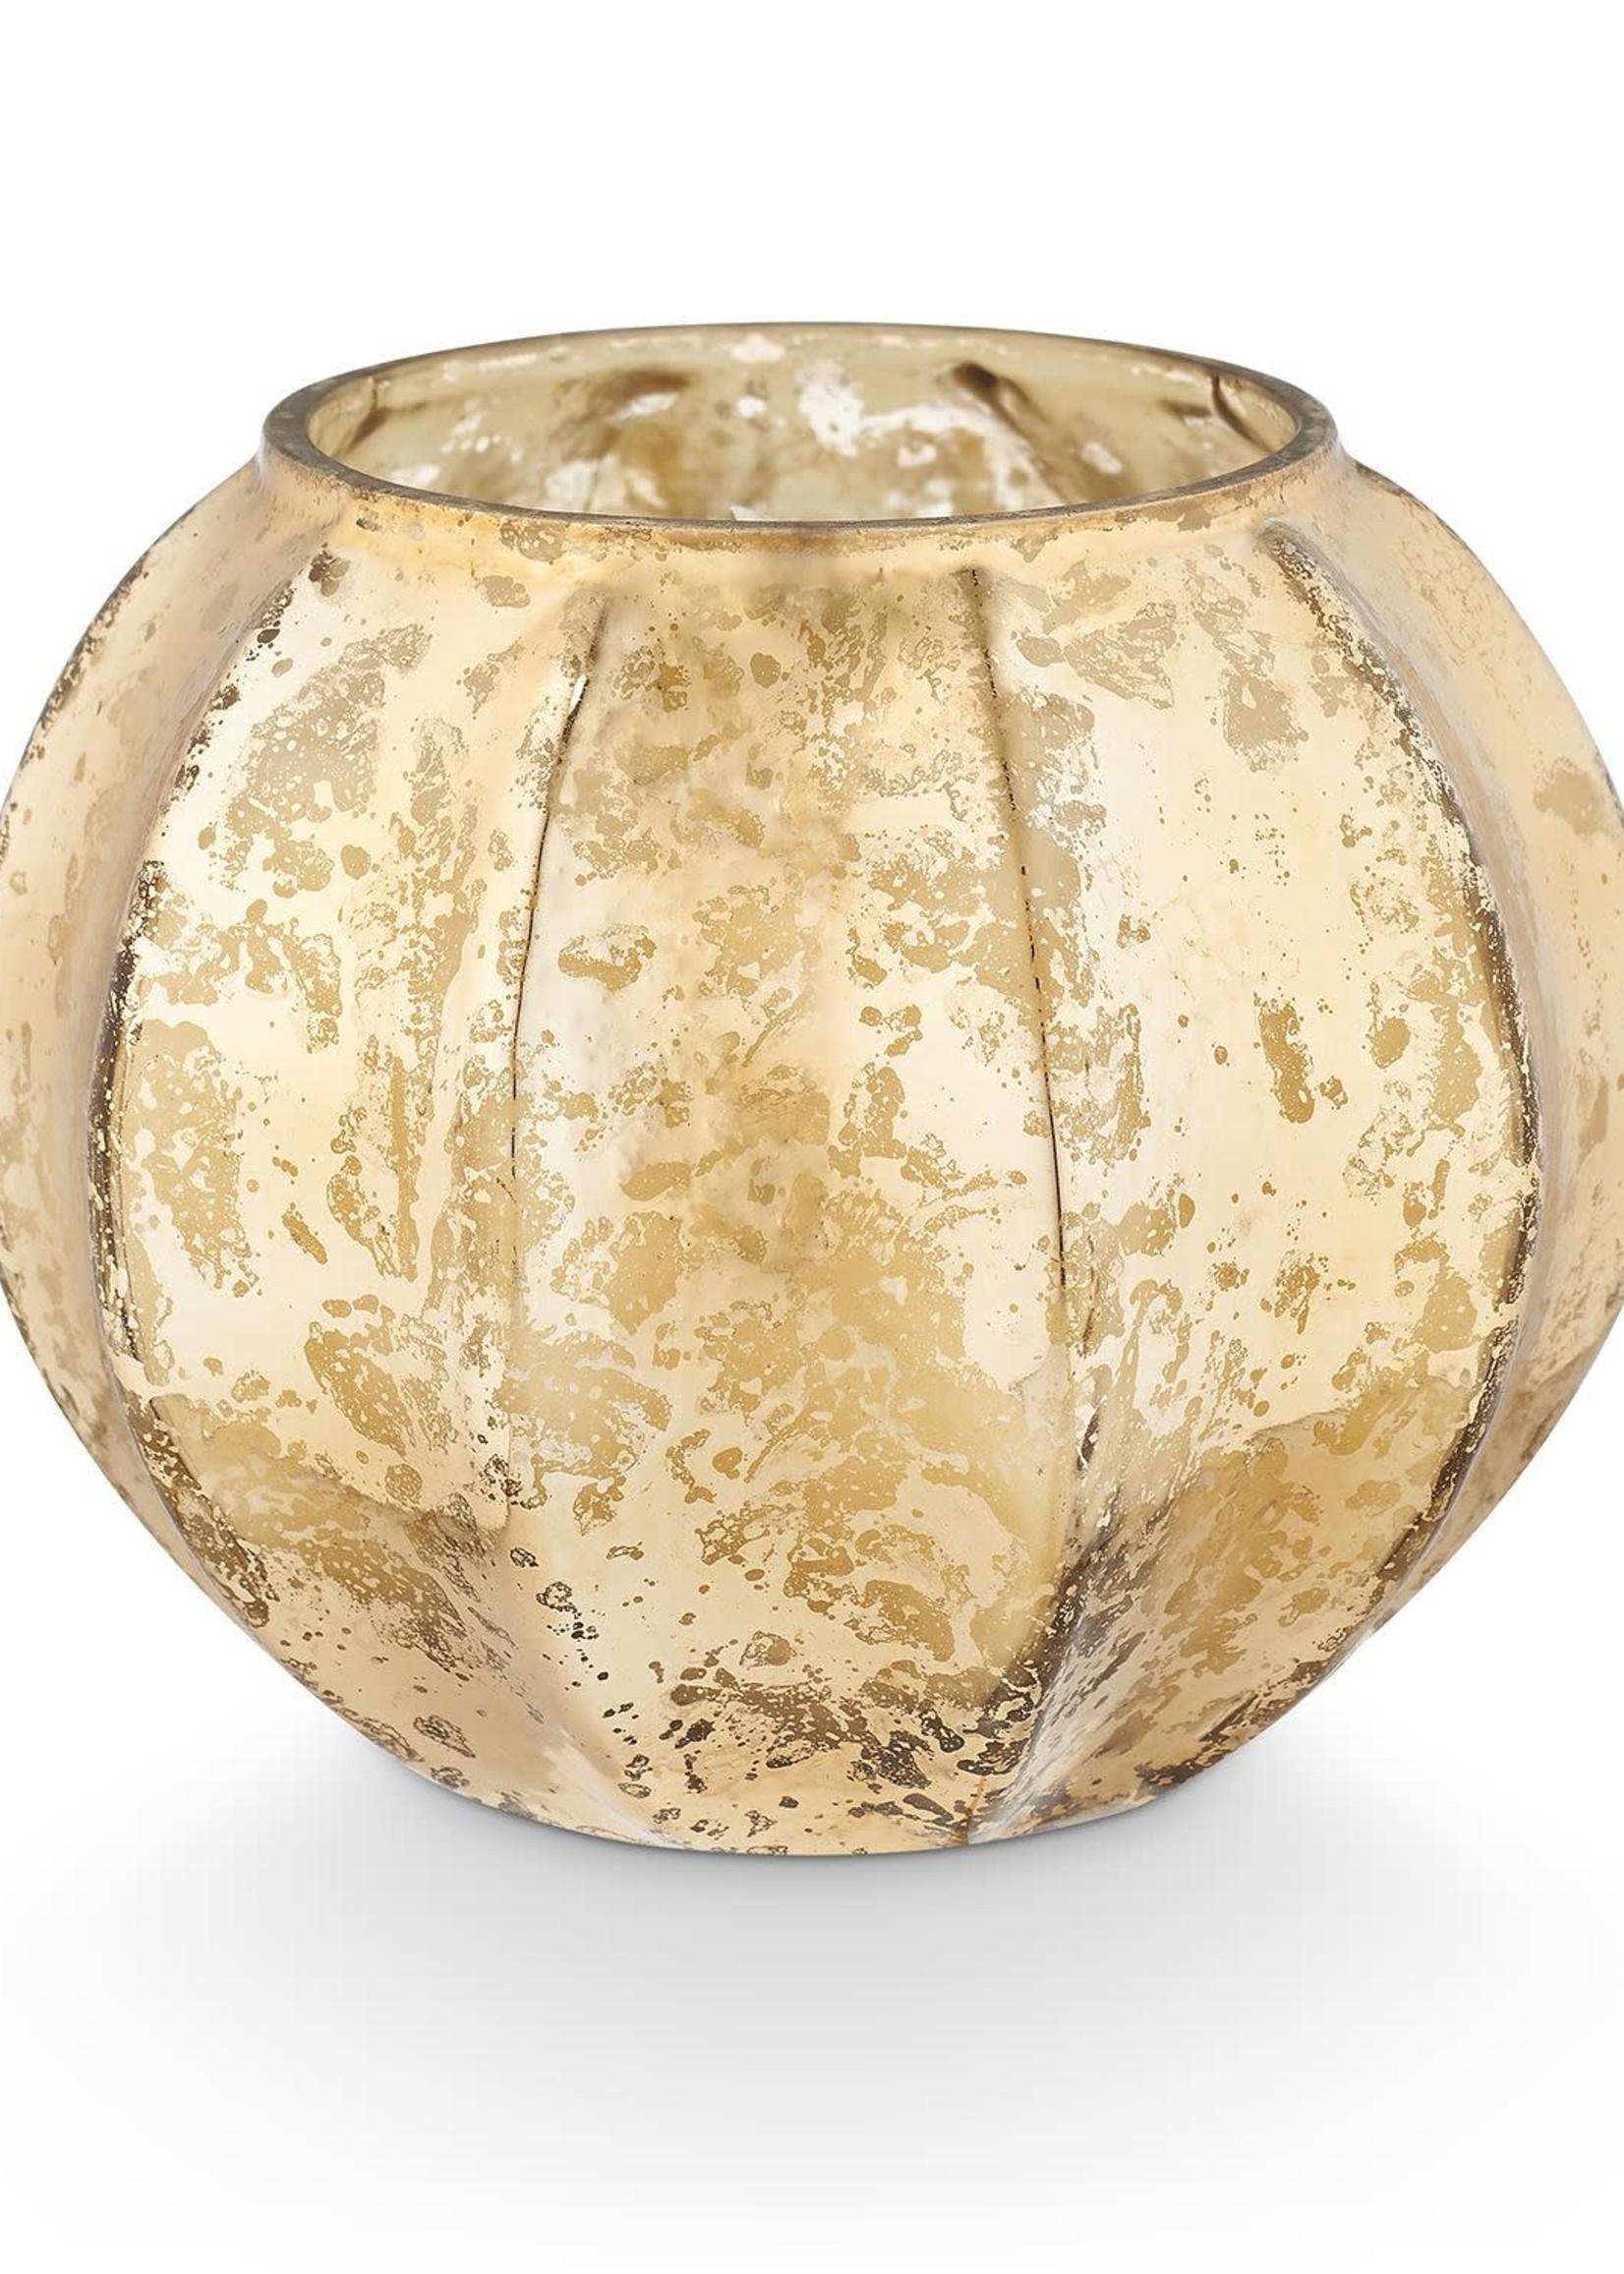 Illume Rustic Pumpkin Mercury Glass Candle